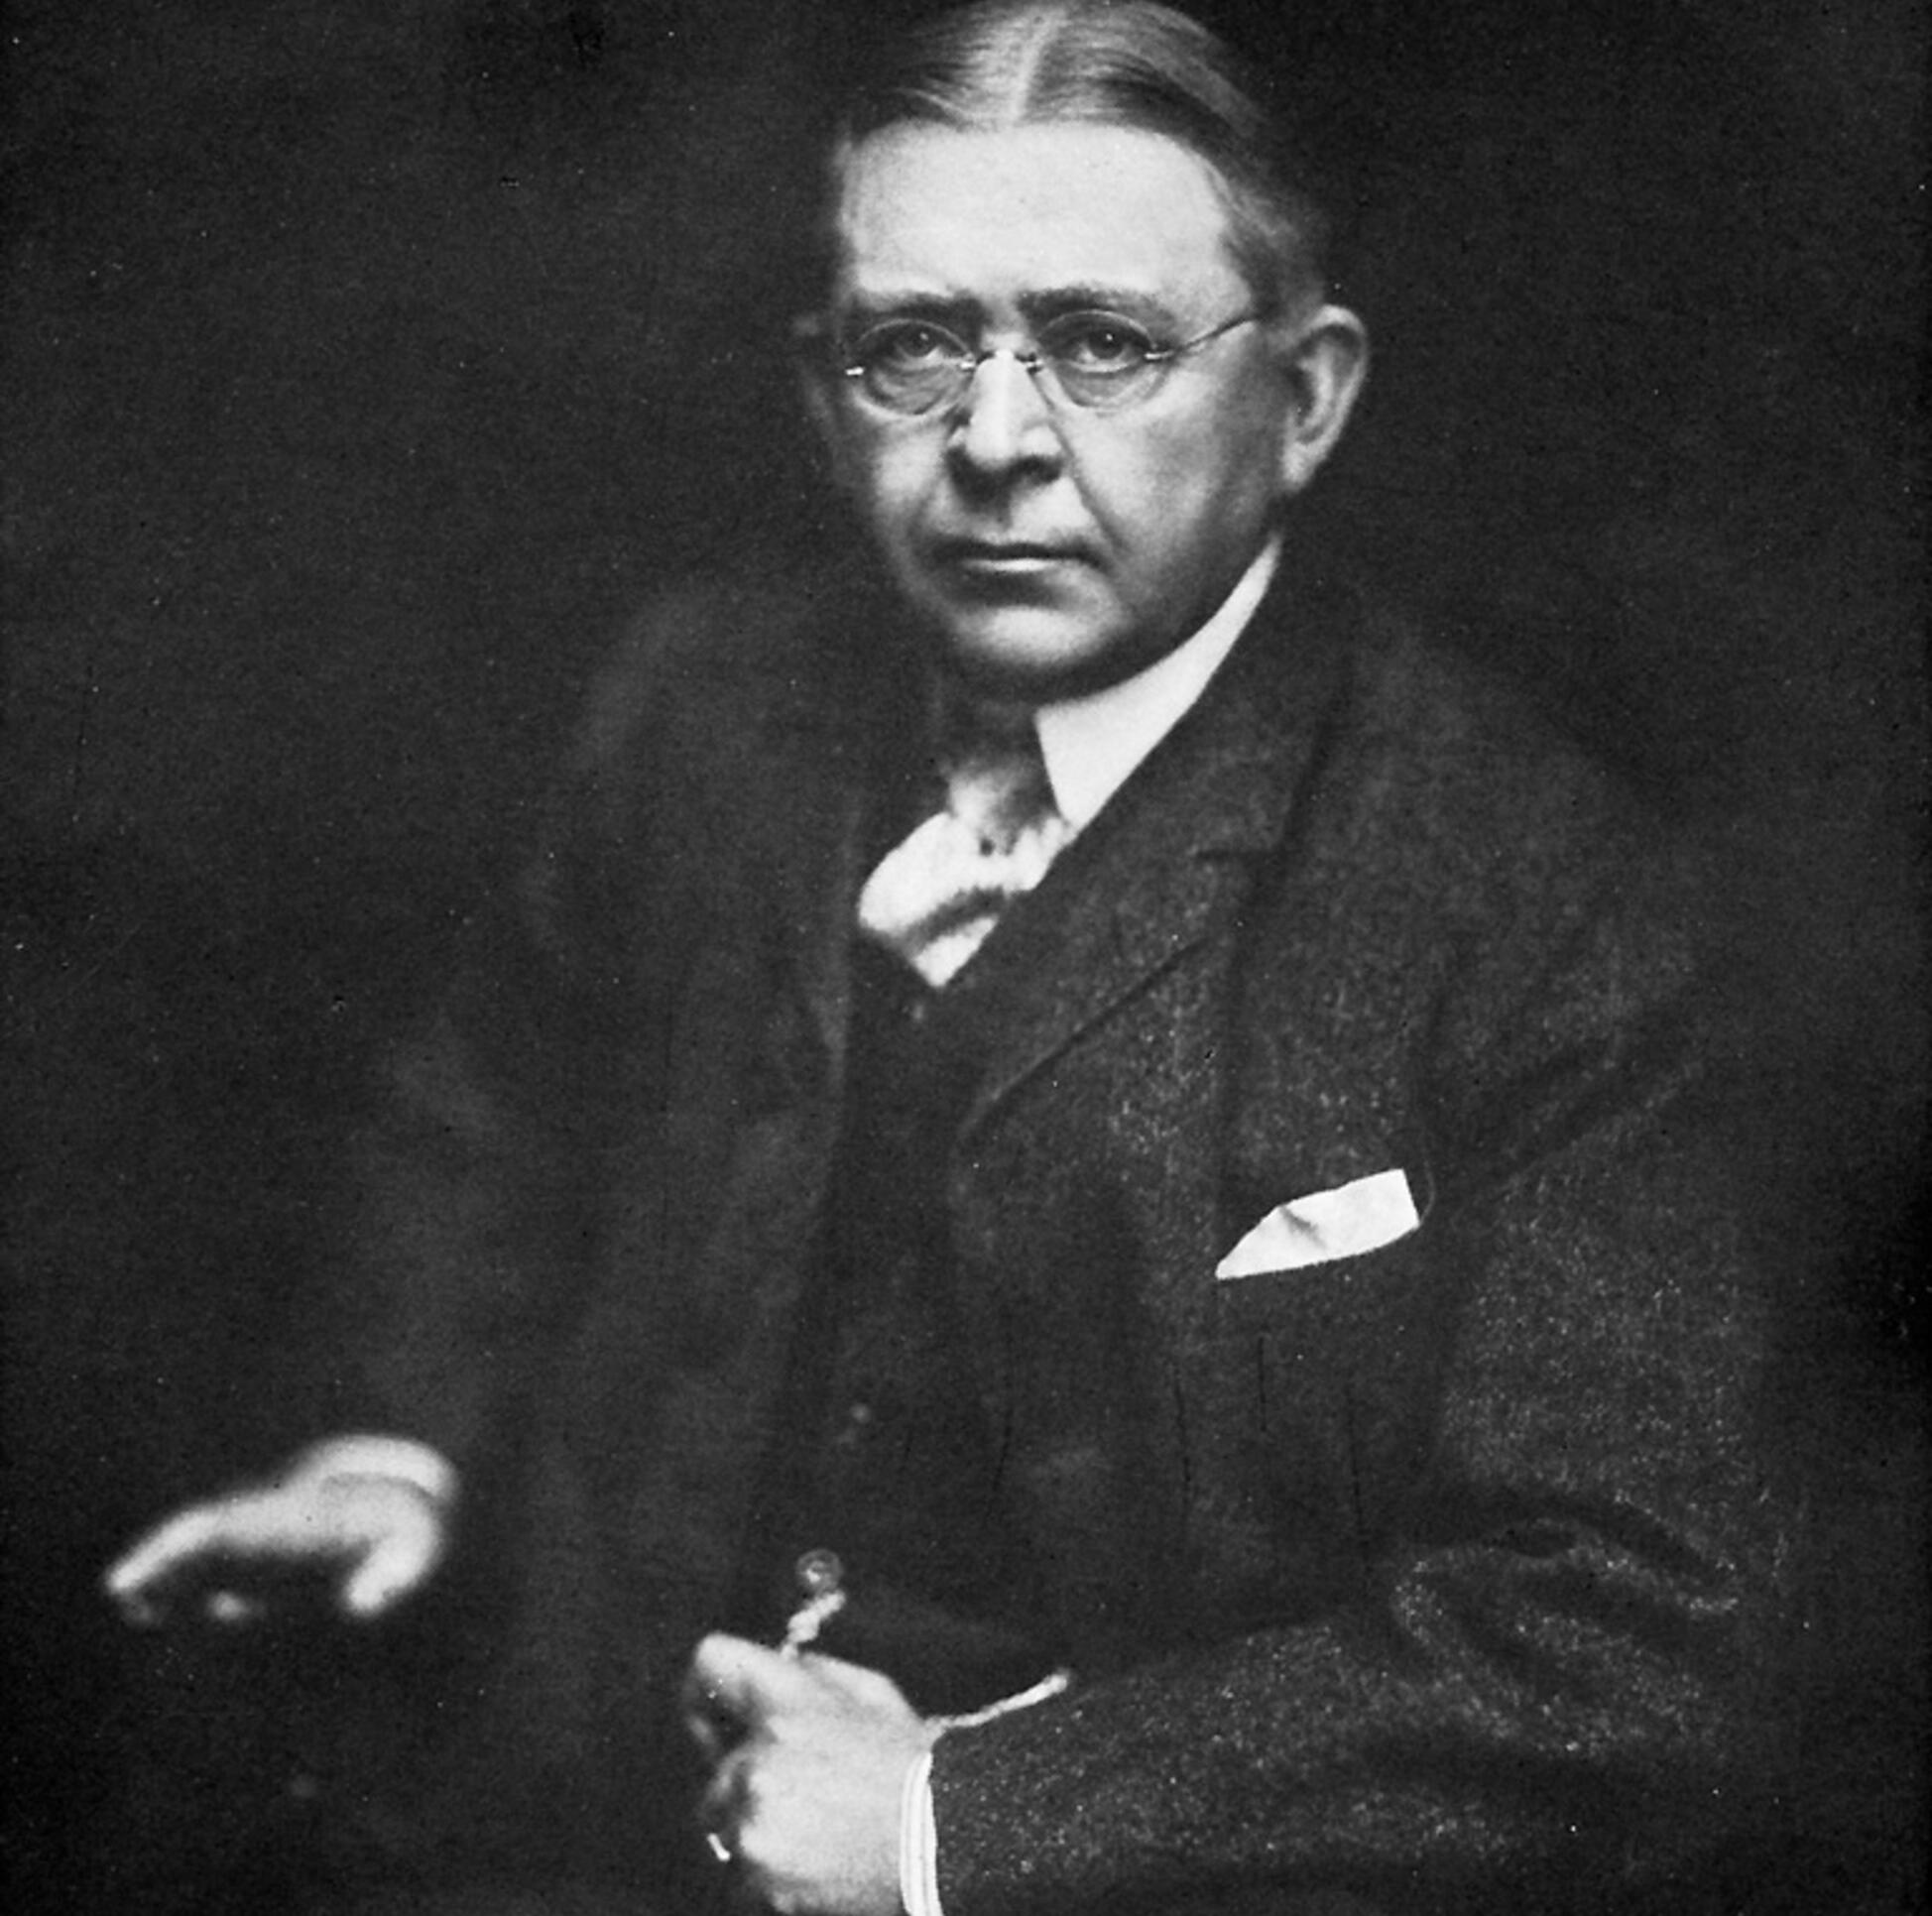 Portrait of Douglas Volk